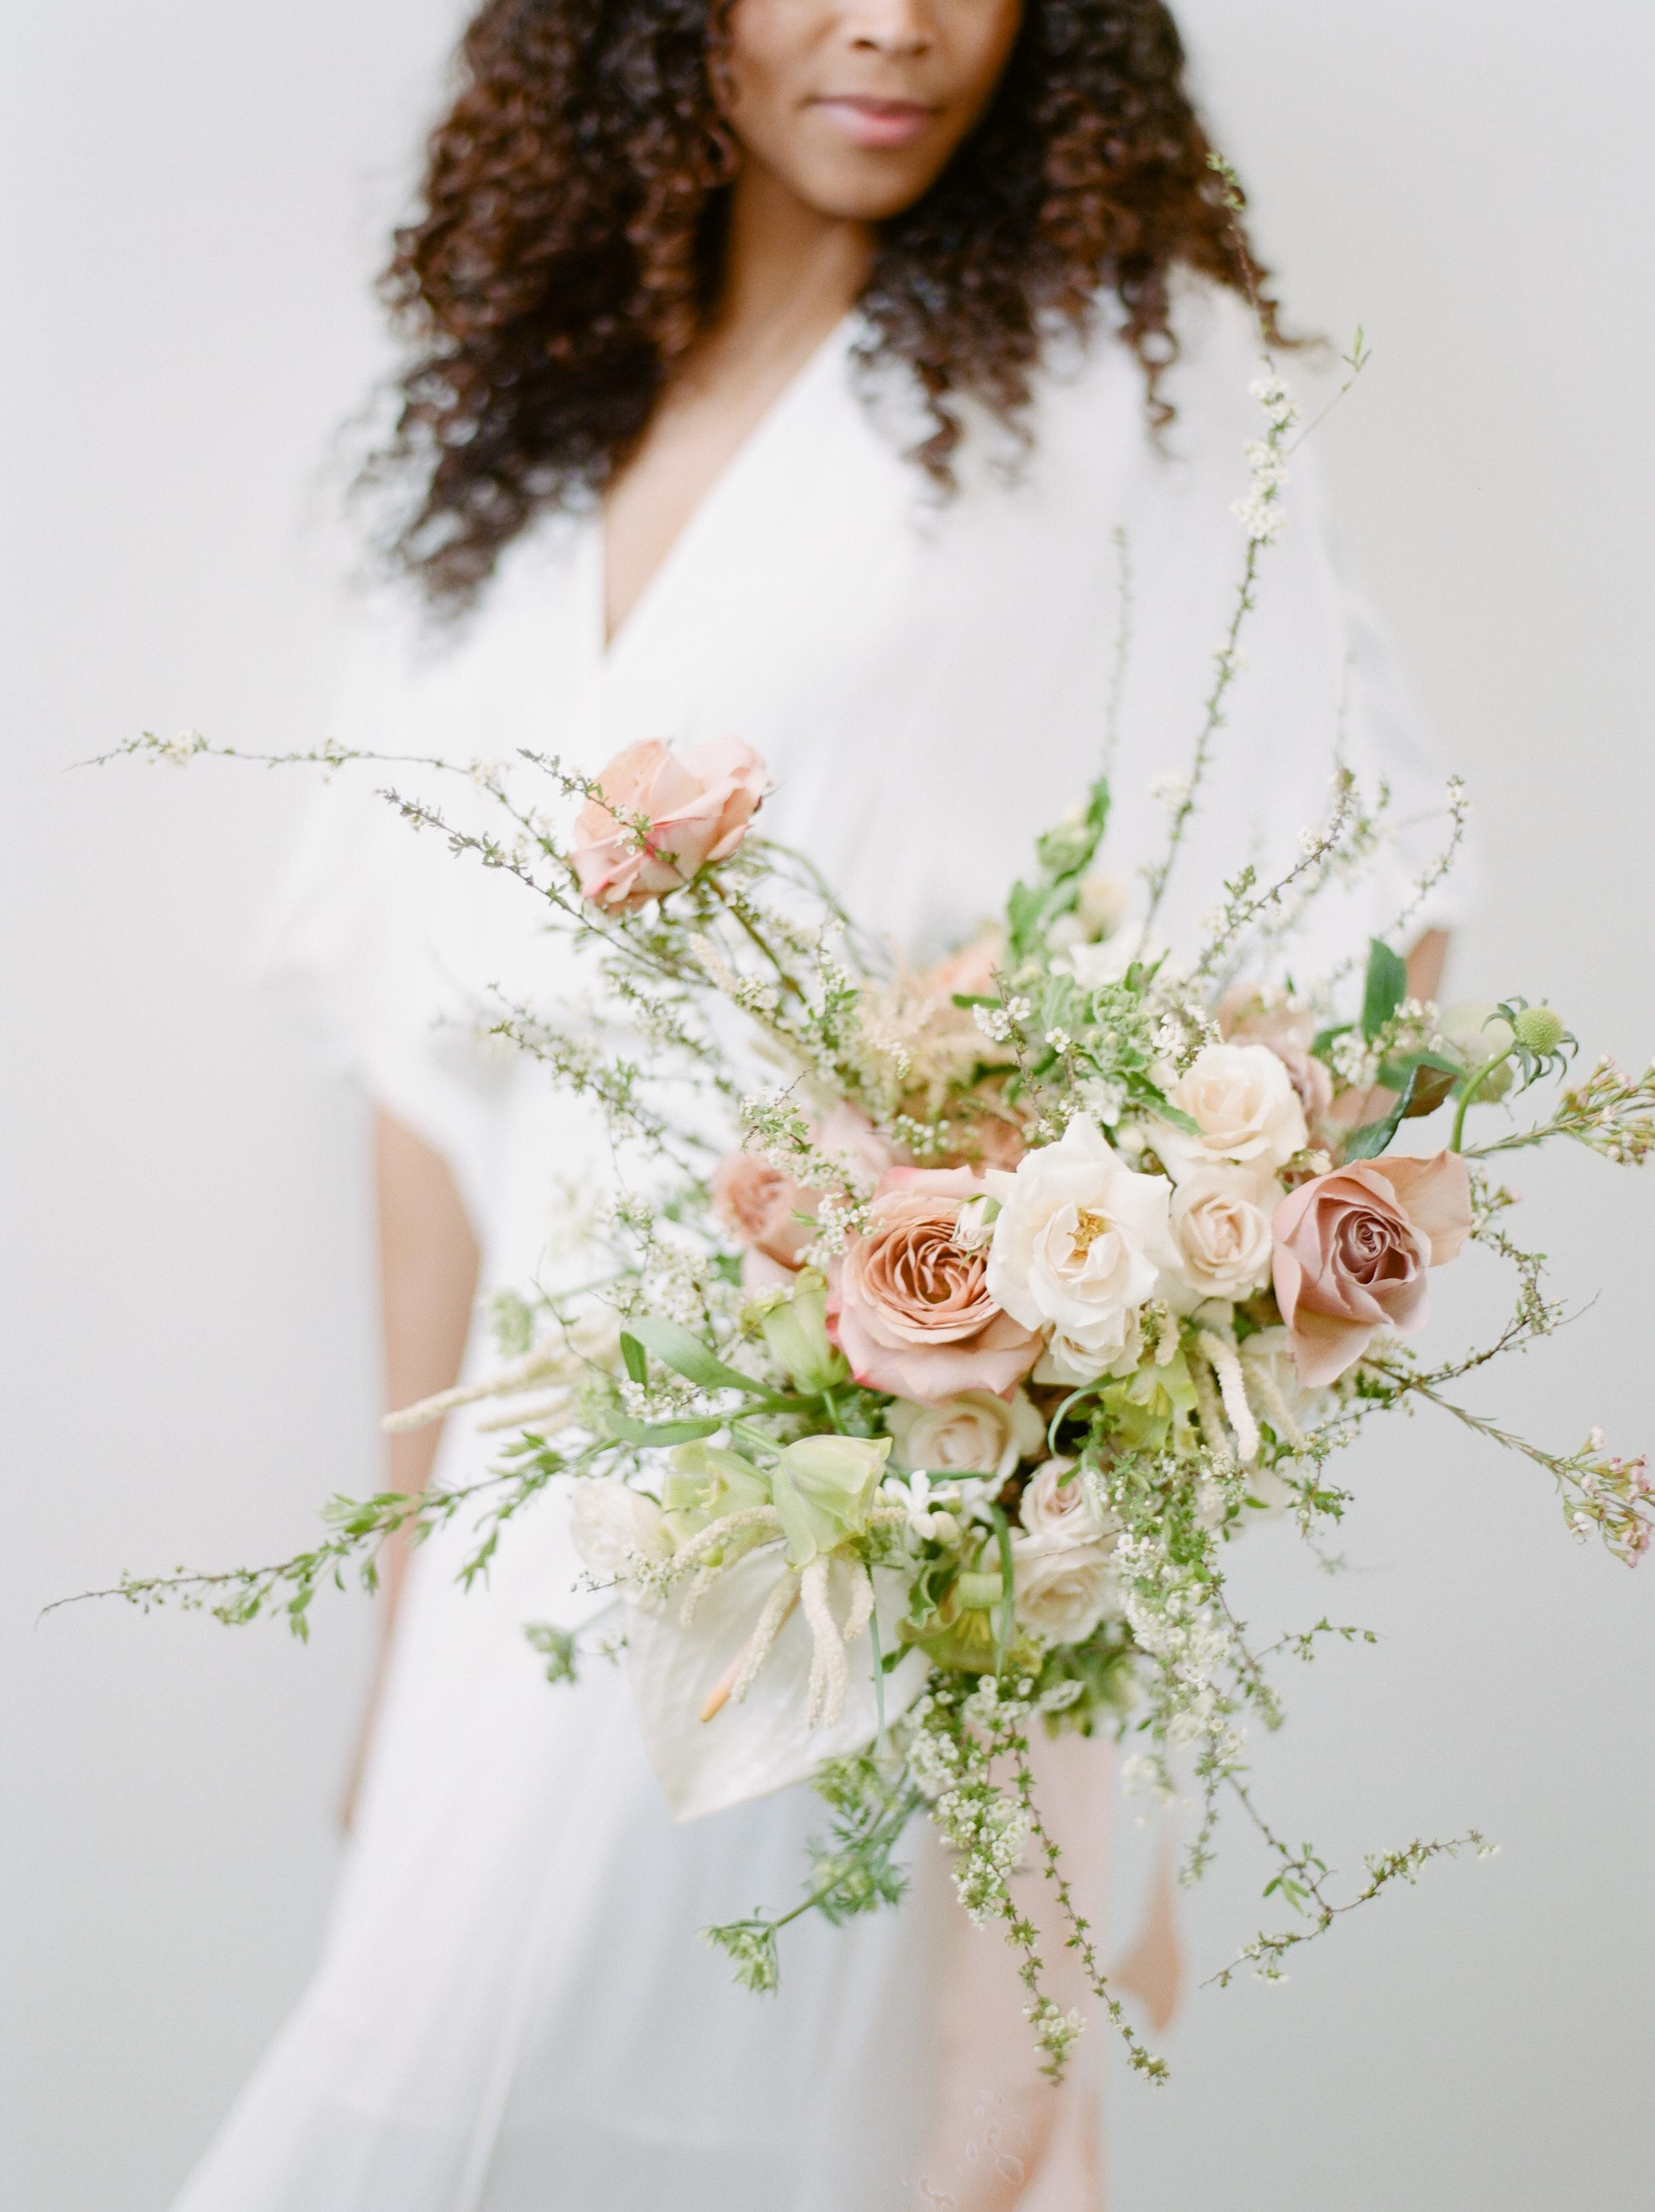 N+B Heather Nan Photography spring bouquet 3.jpg